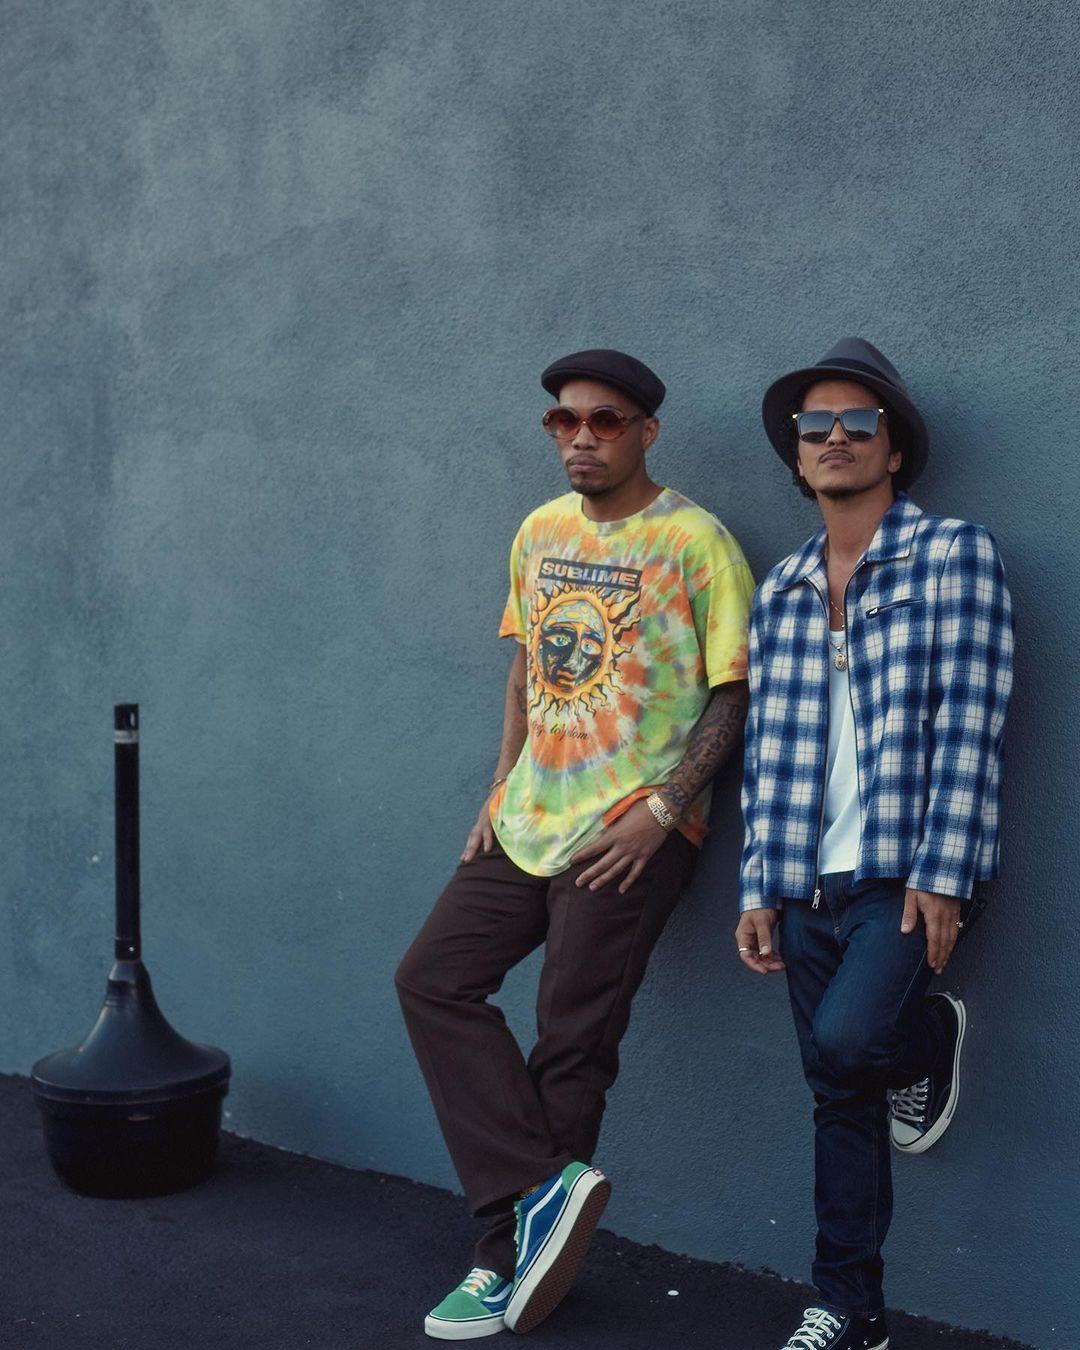 Bruno Mars Anderson .Paak Silk Sonic 2021 pr - Bruno Mars & Anderson .Paak (Silk Sonic) — Skate